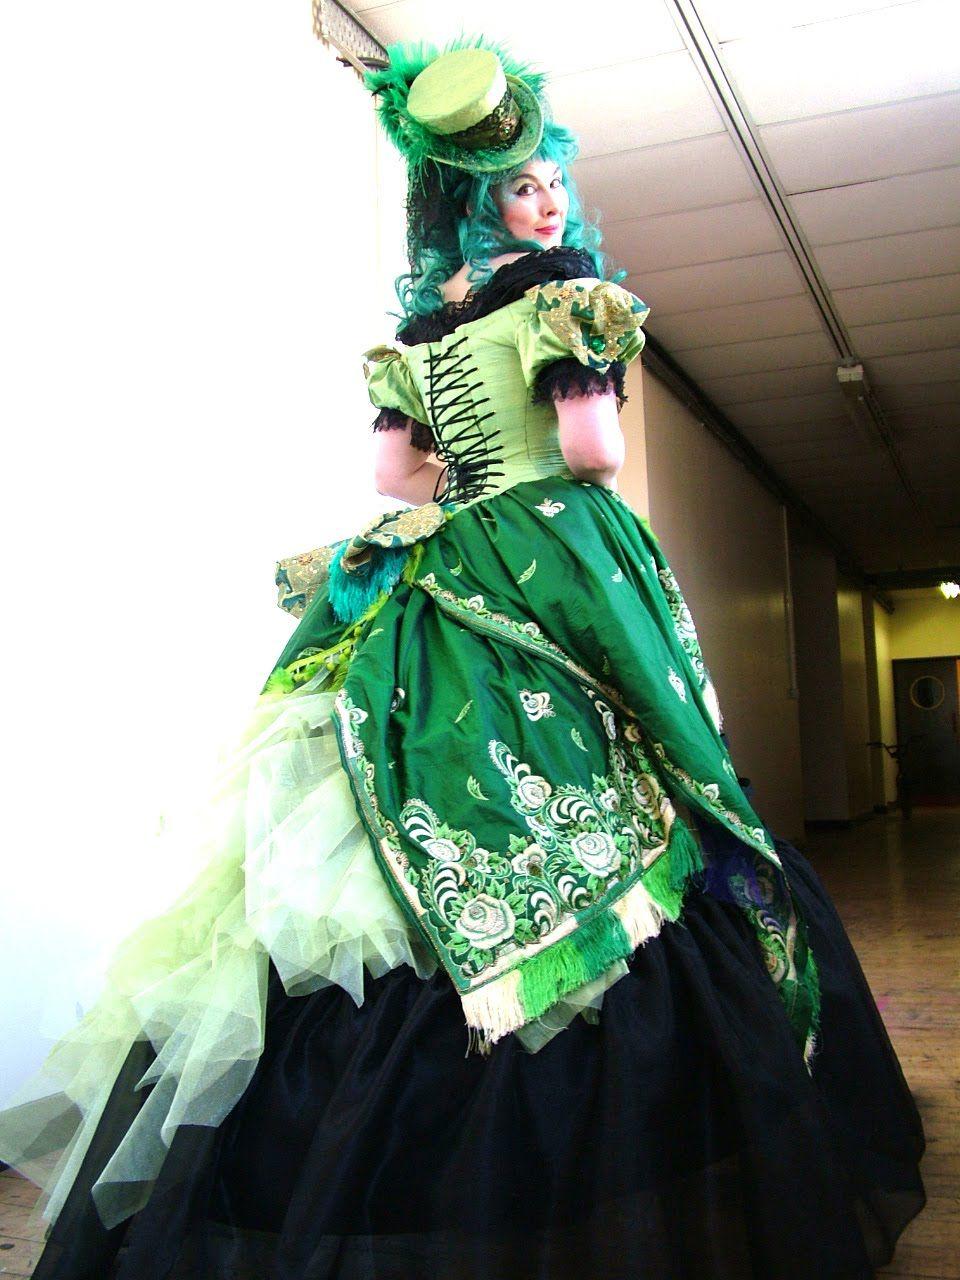 Hereu0027s a ballgown idea Ste&unk Absinthe Faerie Costume  sc 1 st  Pinterest & SparklyJem: costume   Project ideas   Pinterest   Project ideas and ...